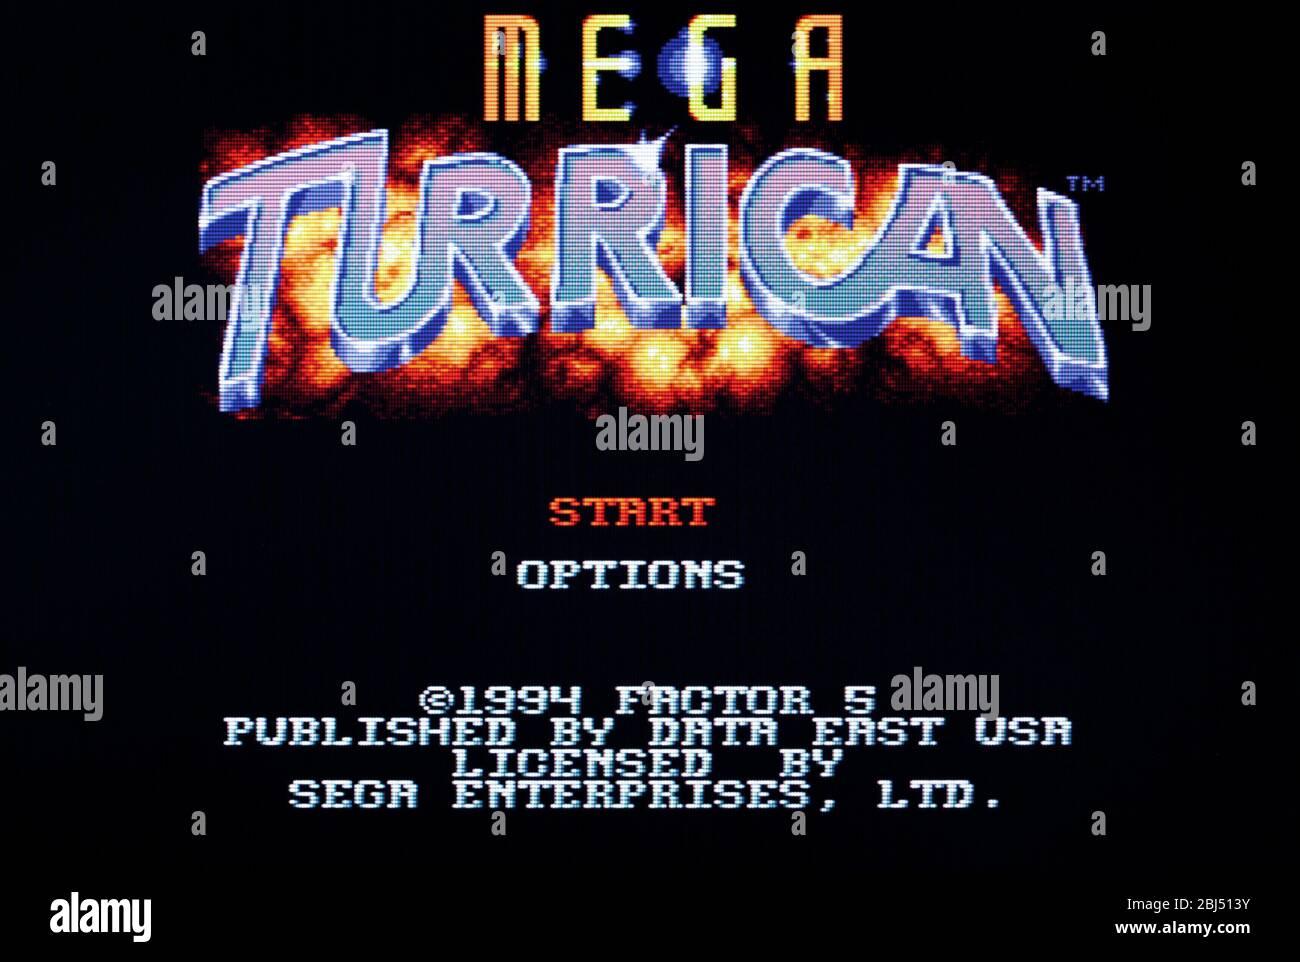 Mega Turrican - Sega Genesis Mega Drive - Editorial use only Stock Photo